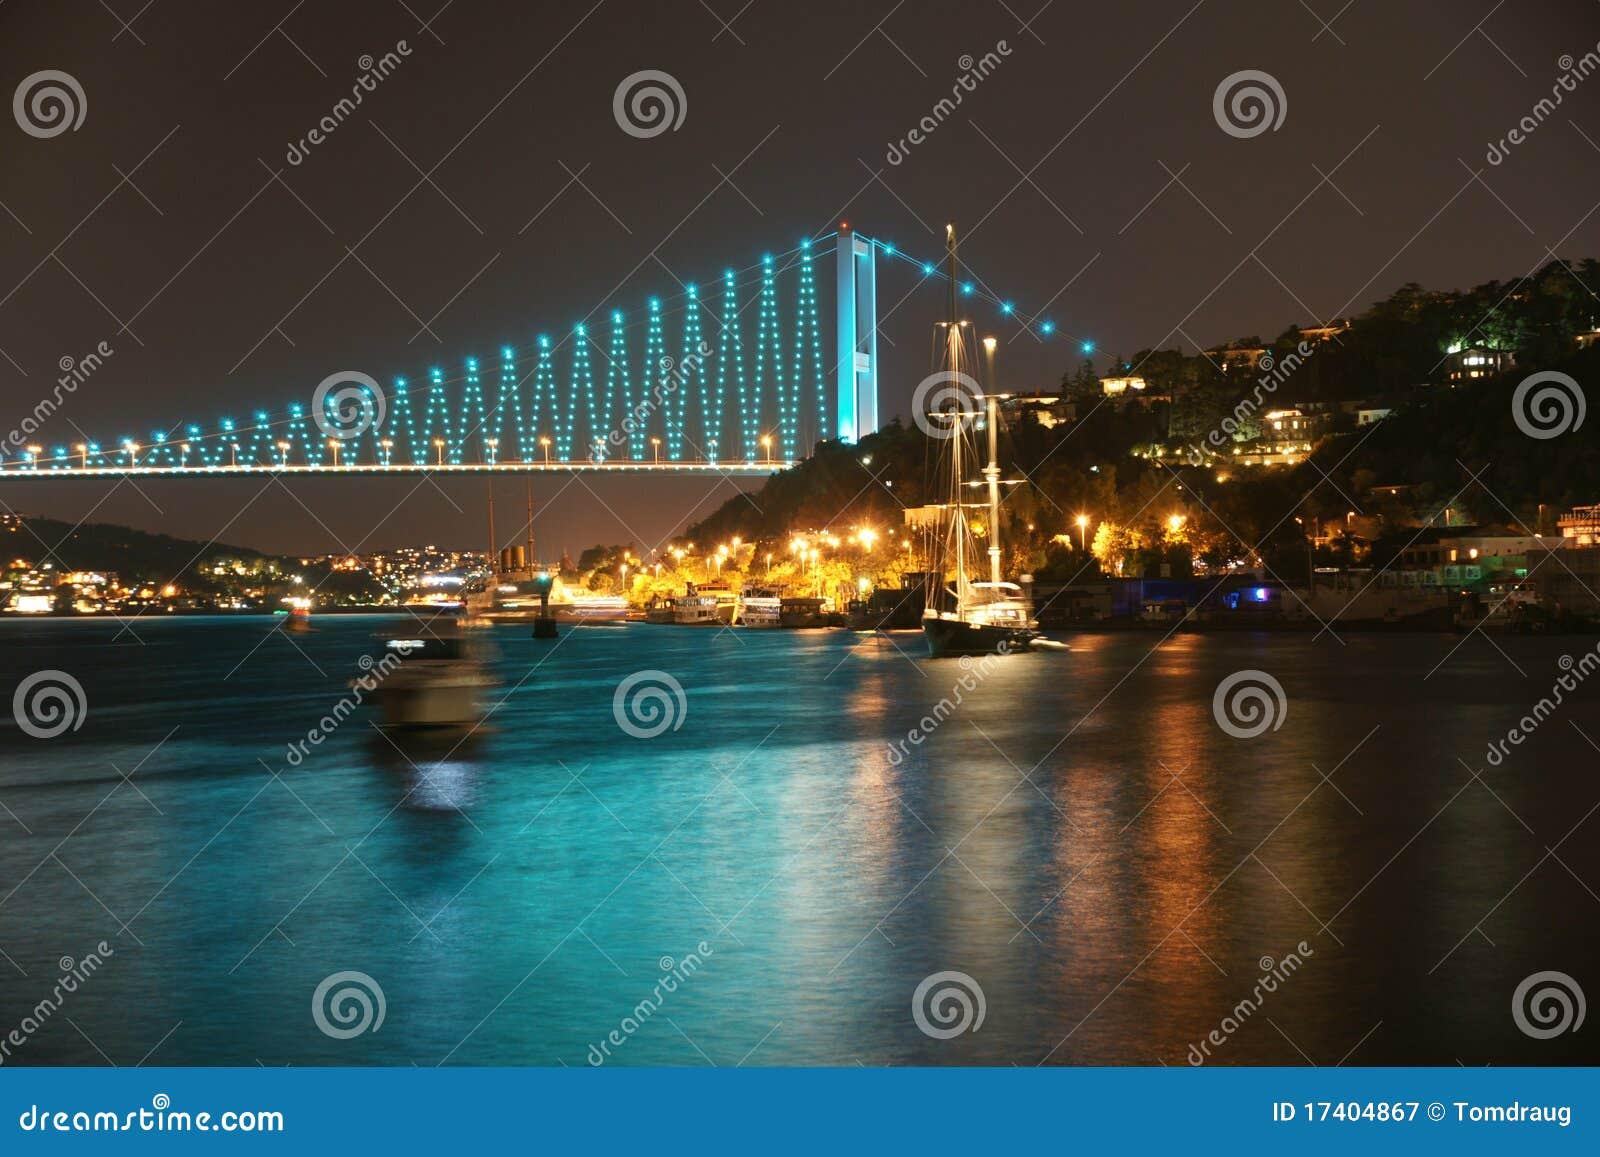 bosphor 2 bridge Turkey opened one of the world's biggest suspension bridges on friday, the   the bridge creates a new link across the bosphorus strait, which.